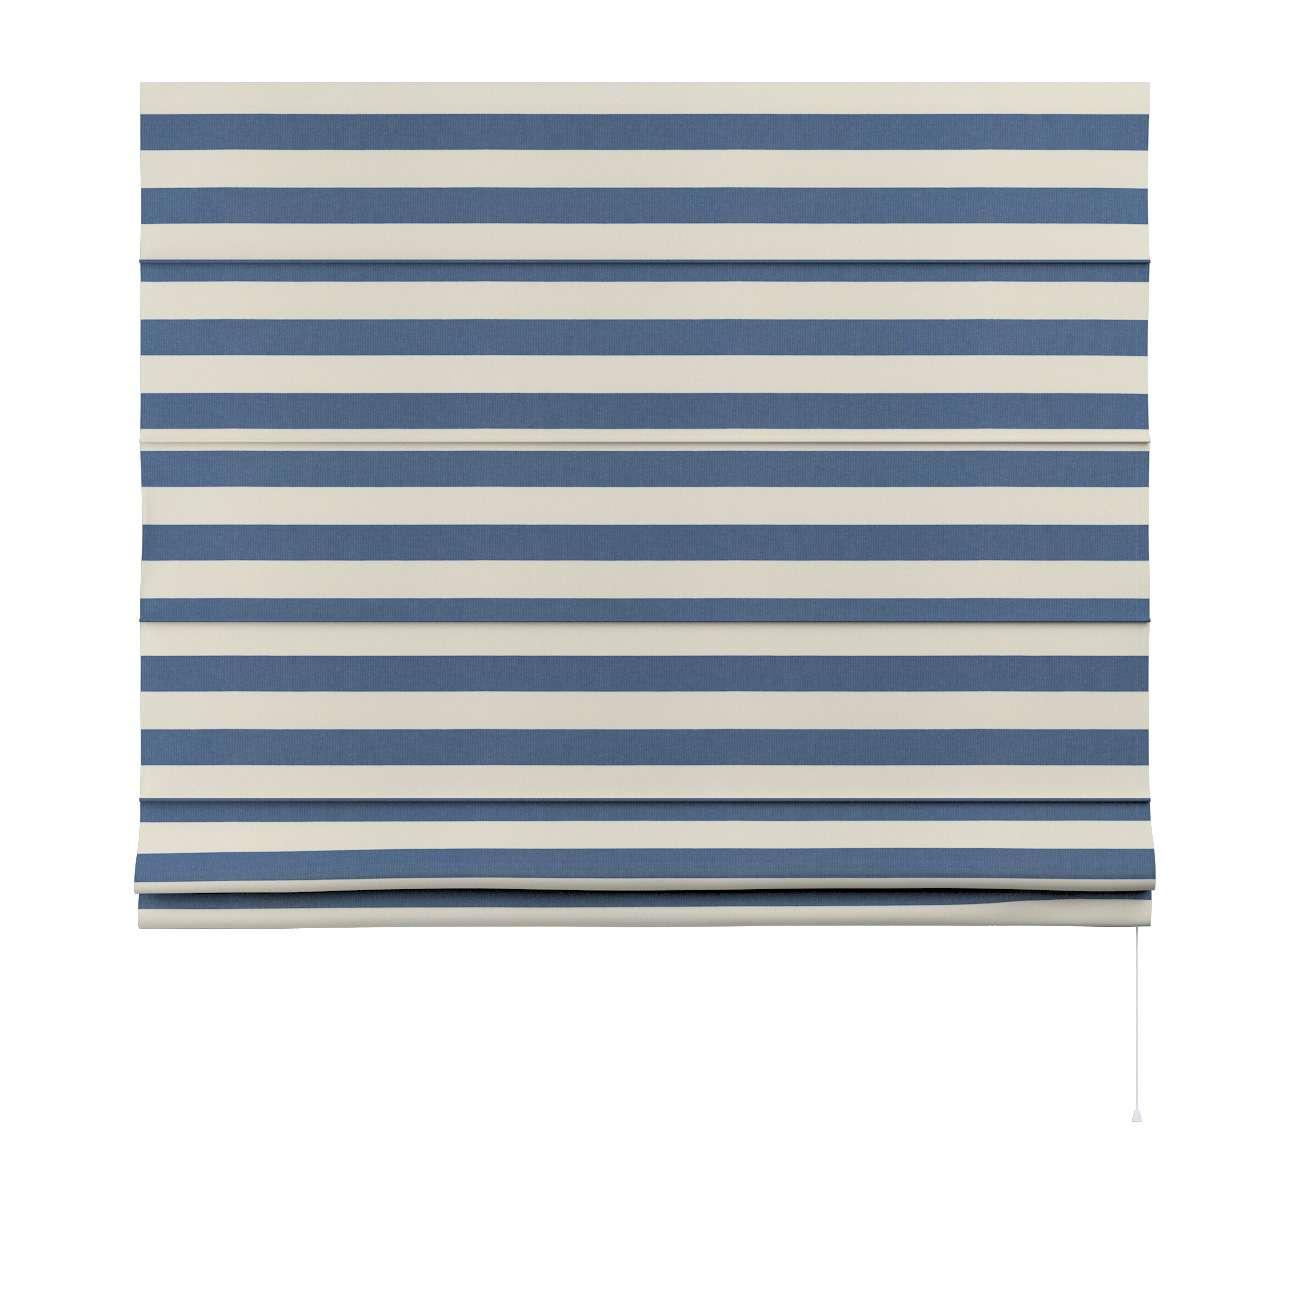 Roleta rzymska Capri w kolekcji Quadro, tkanina: 142-70